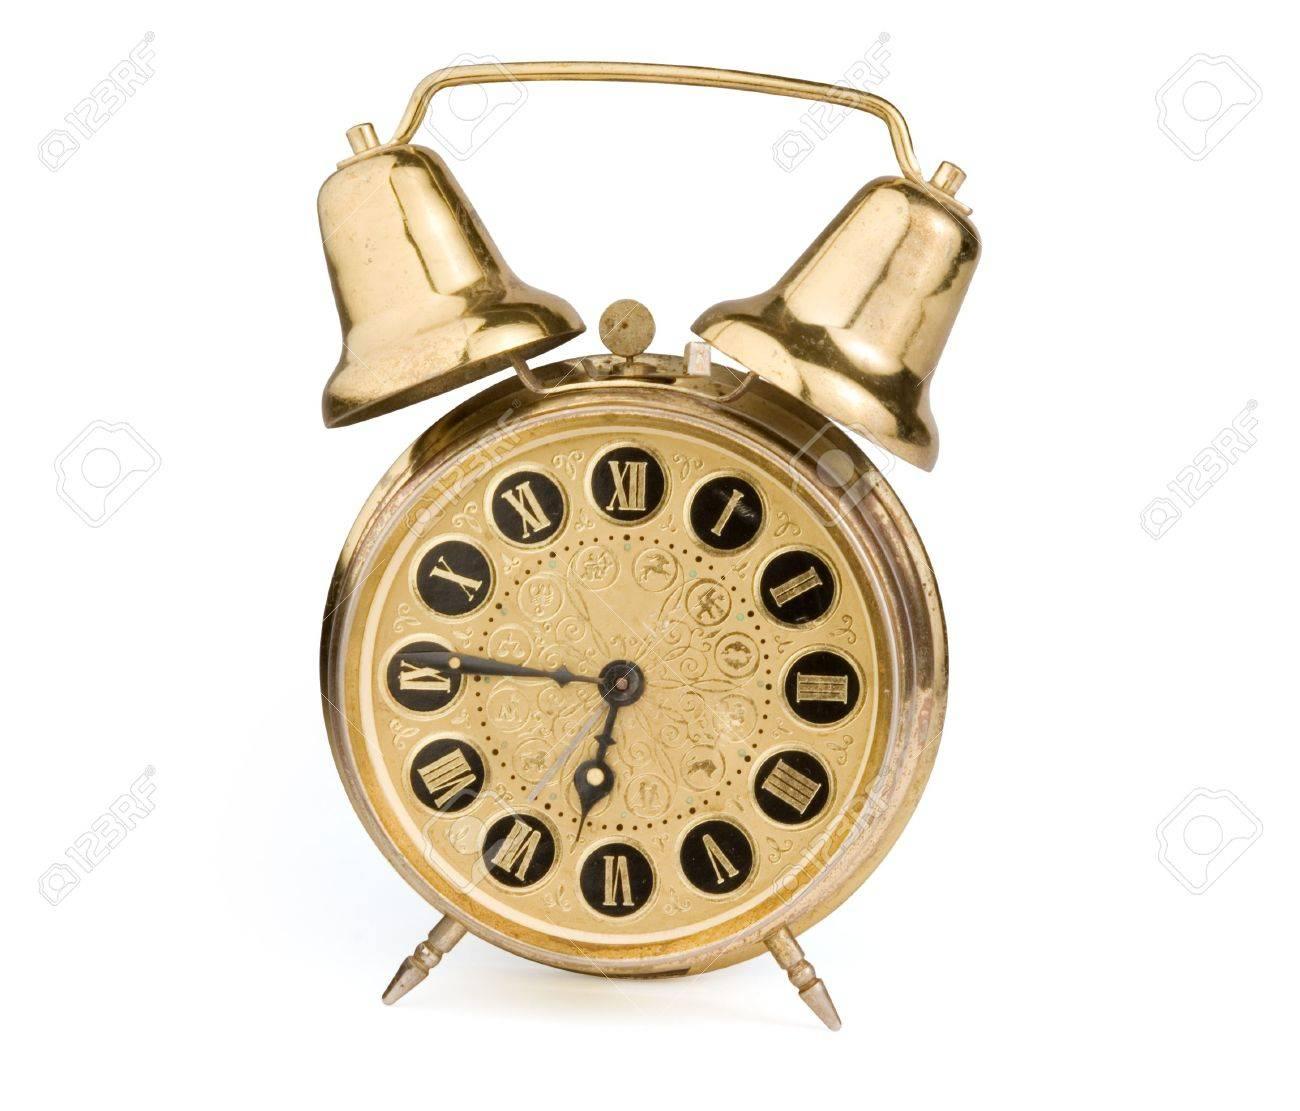 Old antique clock Stock Photo - 5339382